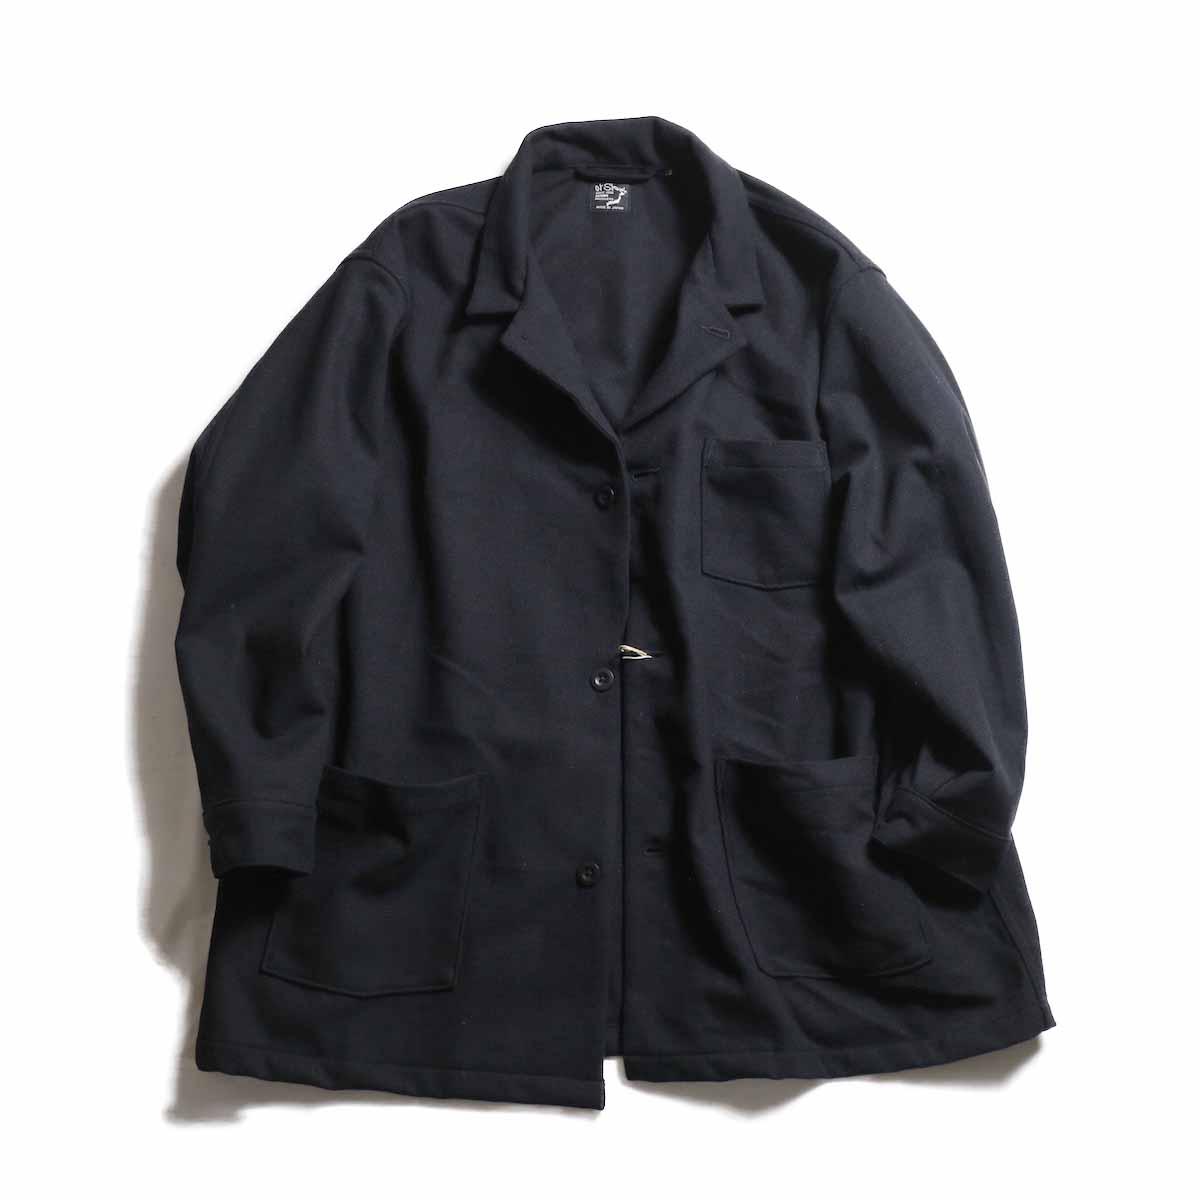 orSlow / Pajama Shirt -Melton Wool Herringbone Twill(BLACK)